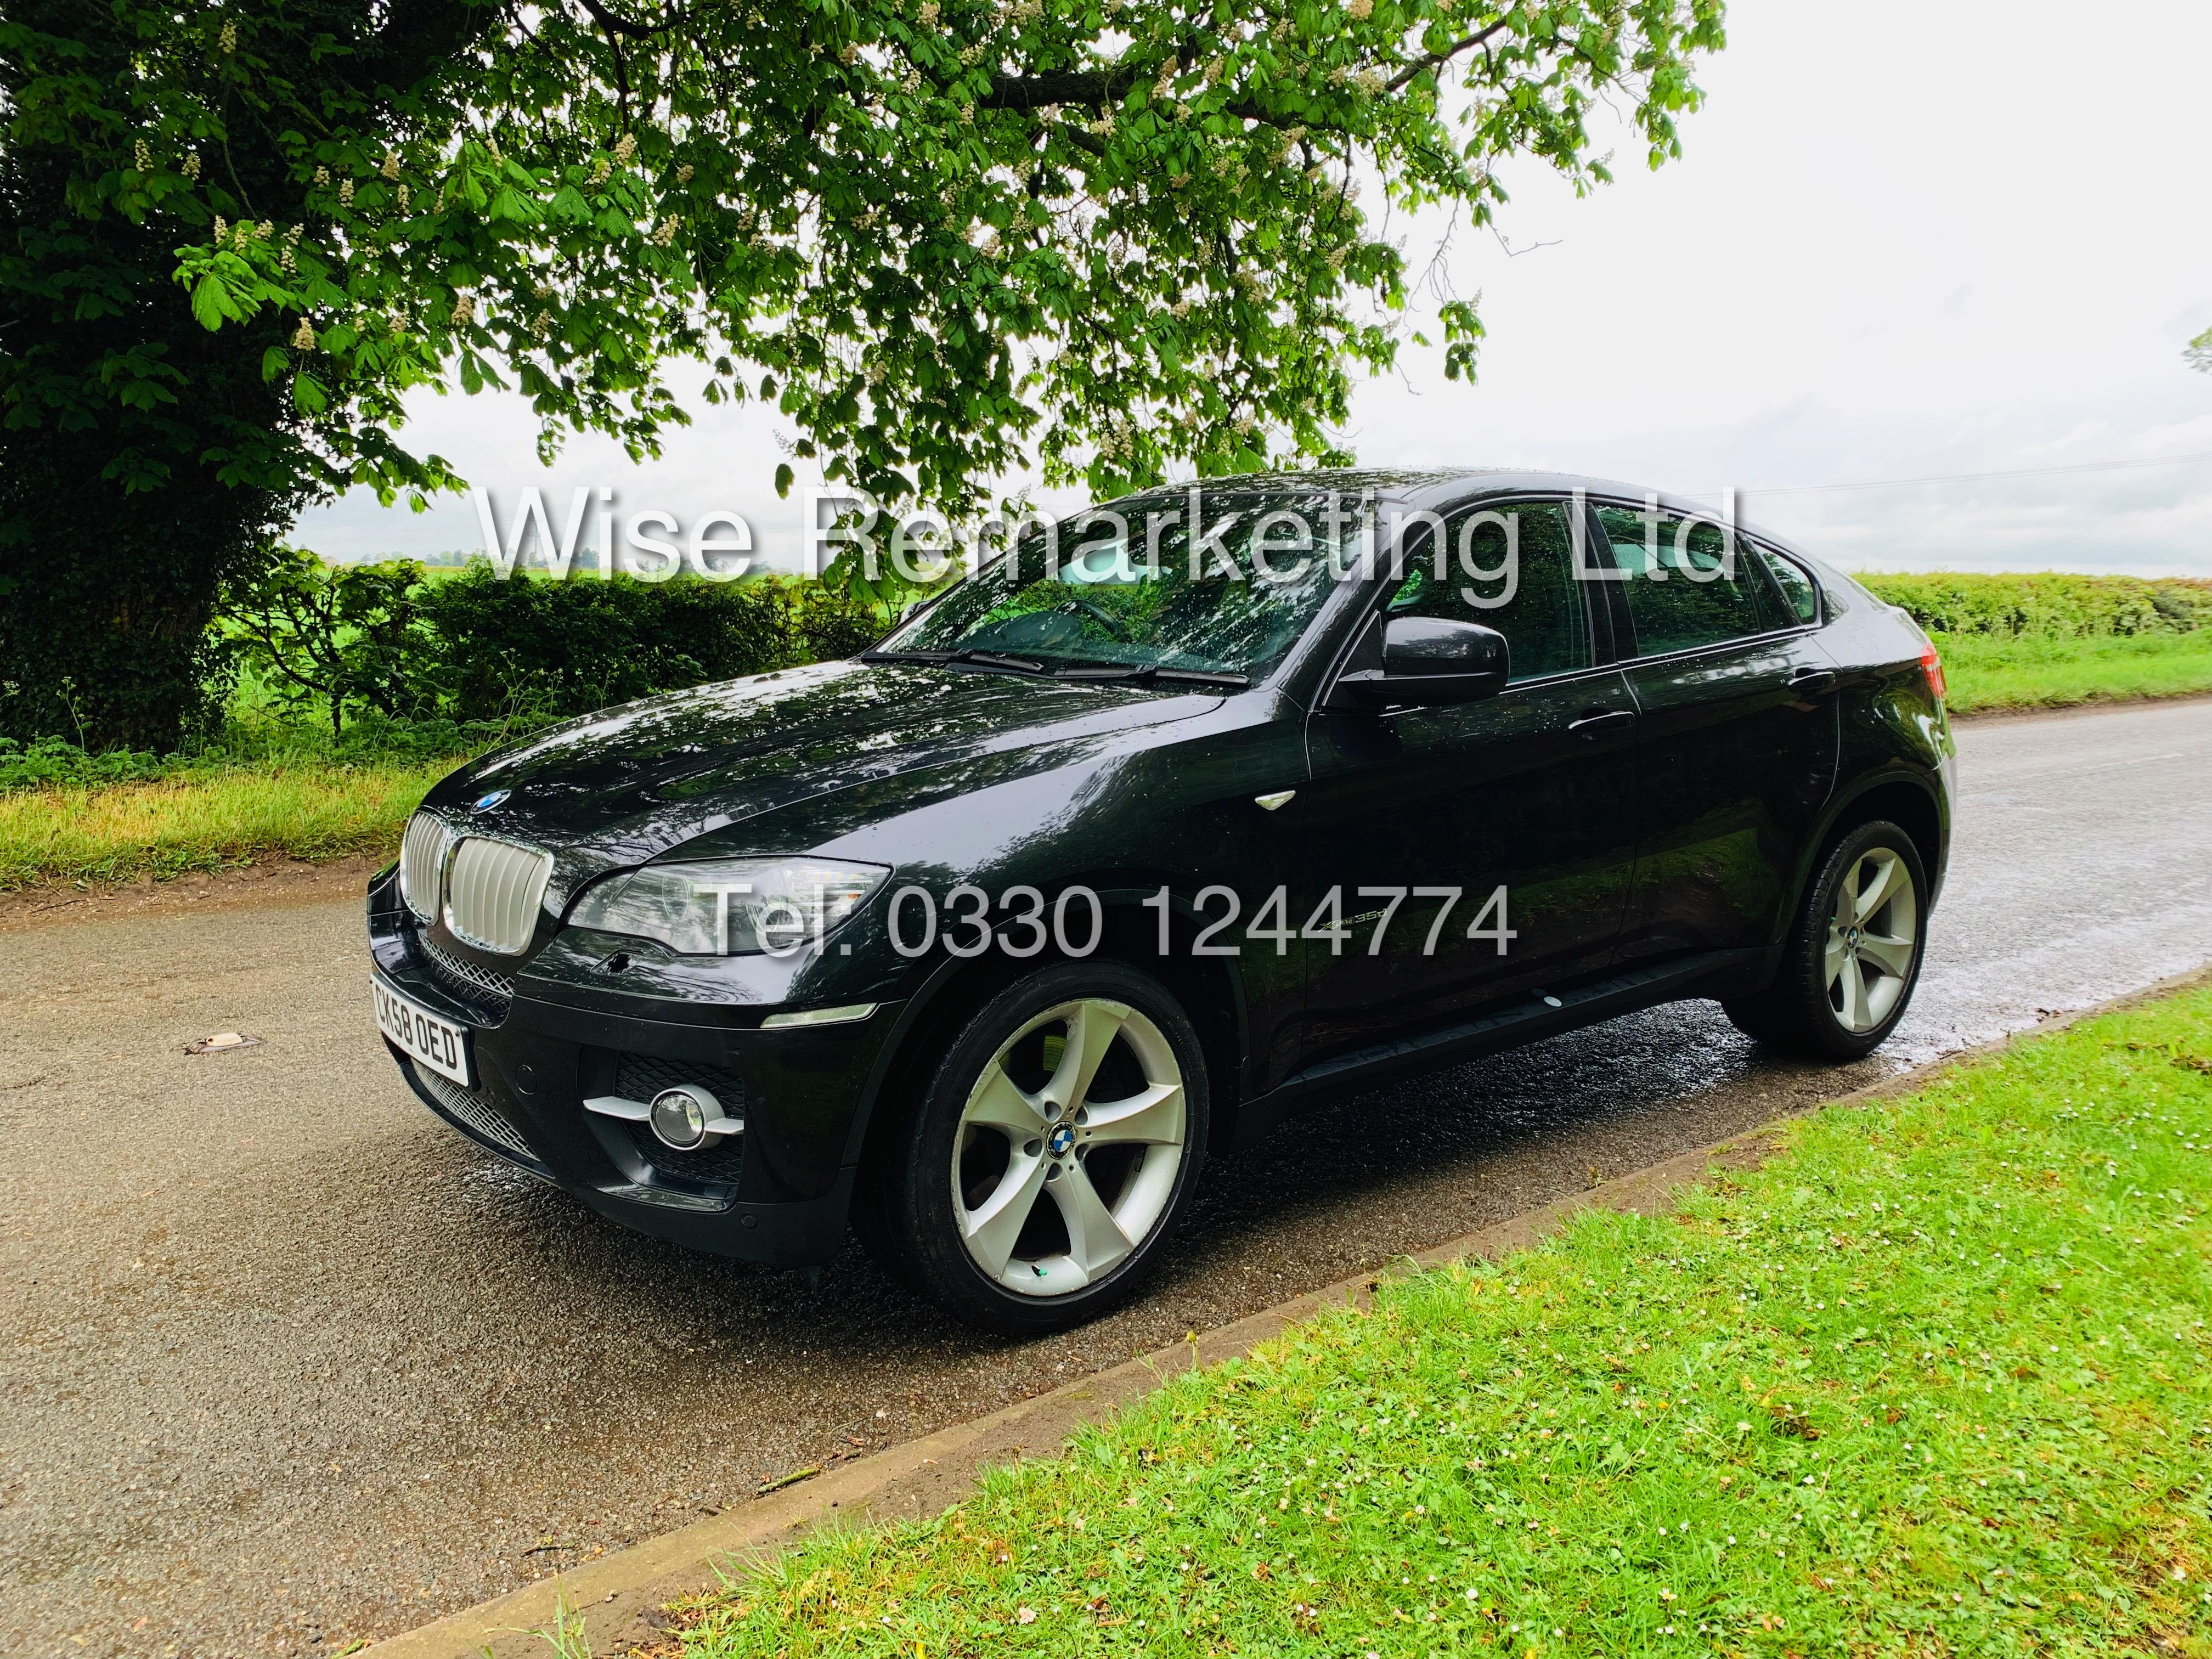 BMW X6 XDRIVE 35D AUTO (2009 SPEC) *1 PREVIOUS OWNER* PARKING AID - SAT NAV - FSH